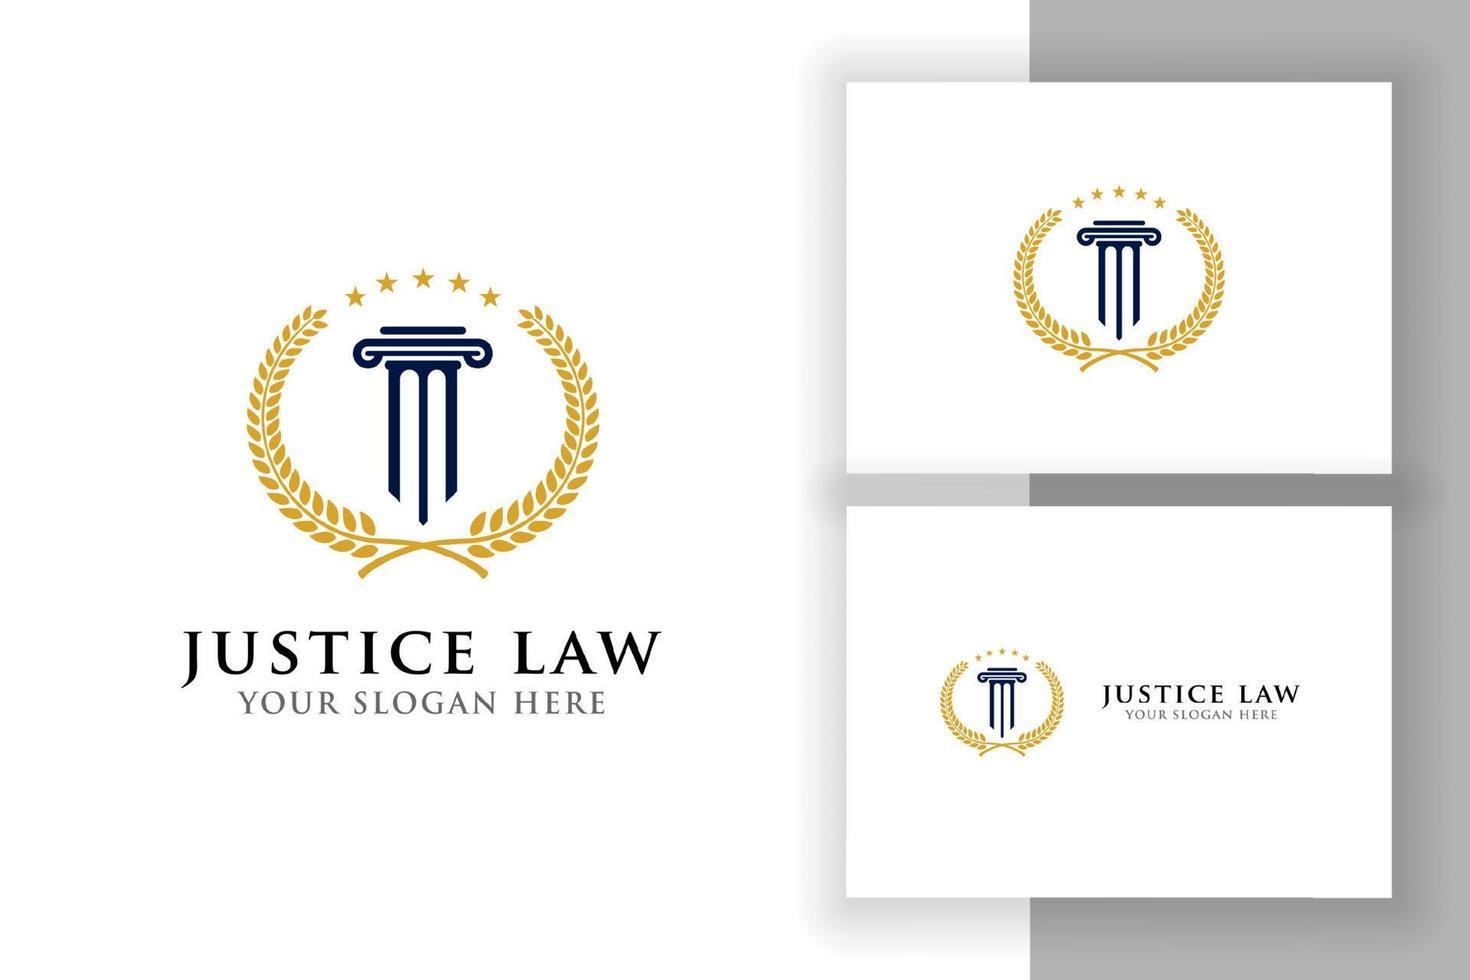 emblema do modelo de design de logotipo do pilar. modelo de design de logotipo de advogado e lei de justiça. modelo de logotipo de emblema de advogado vetor